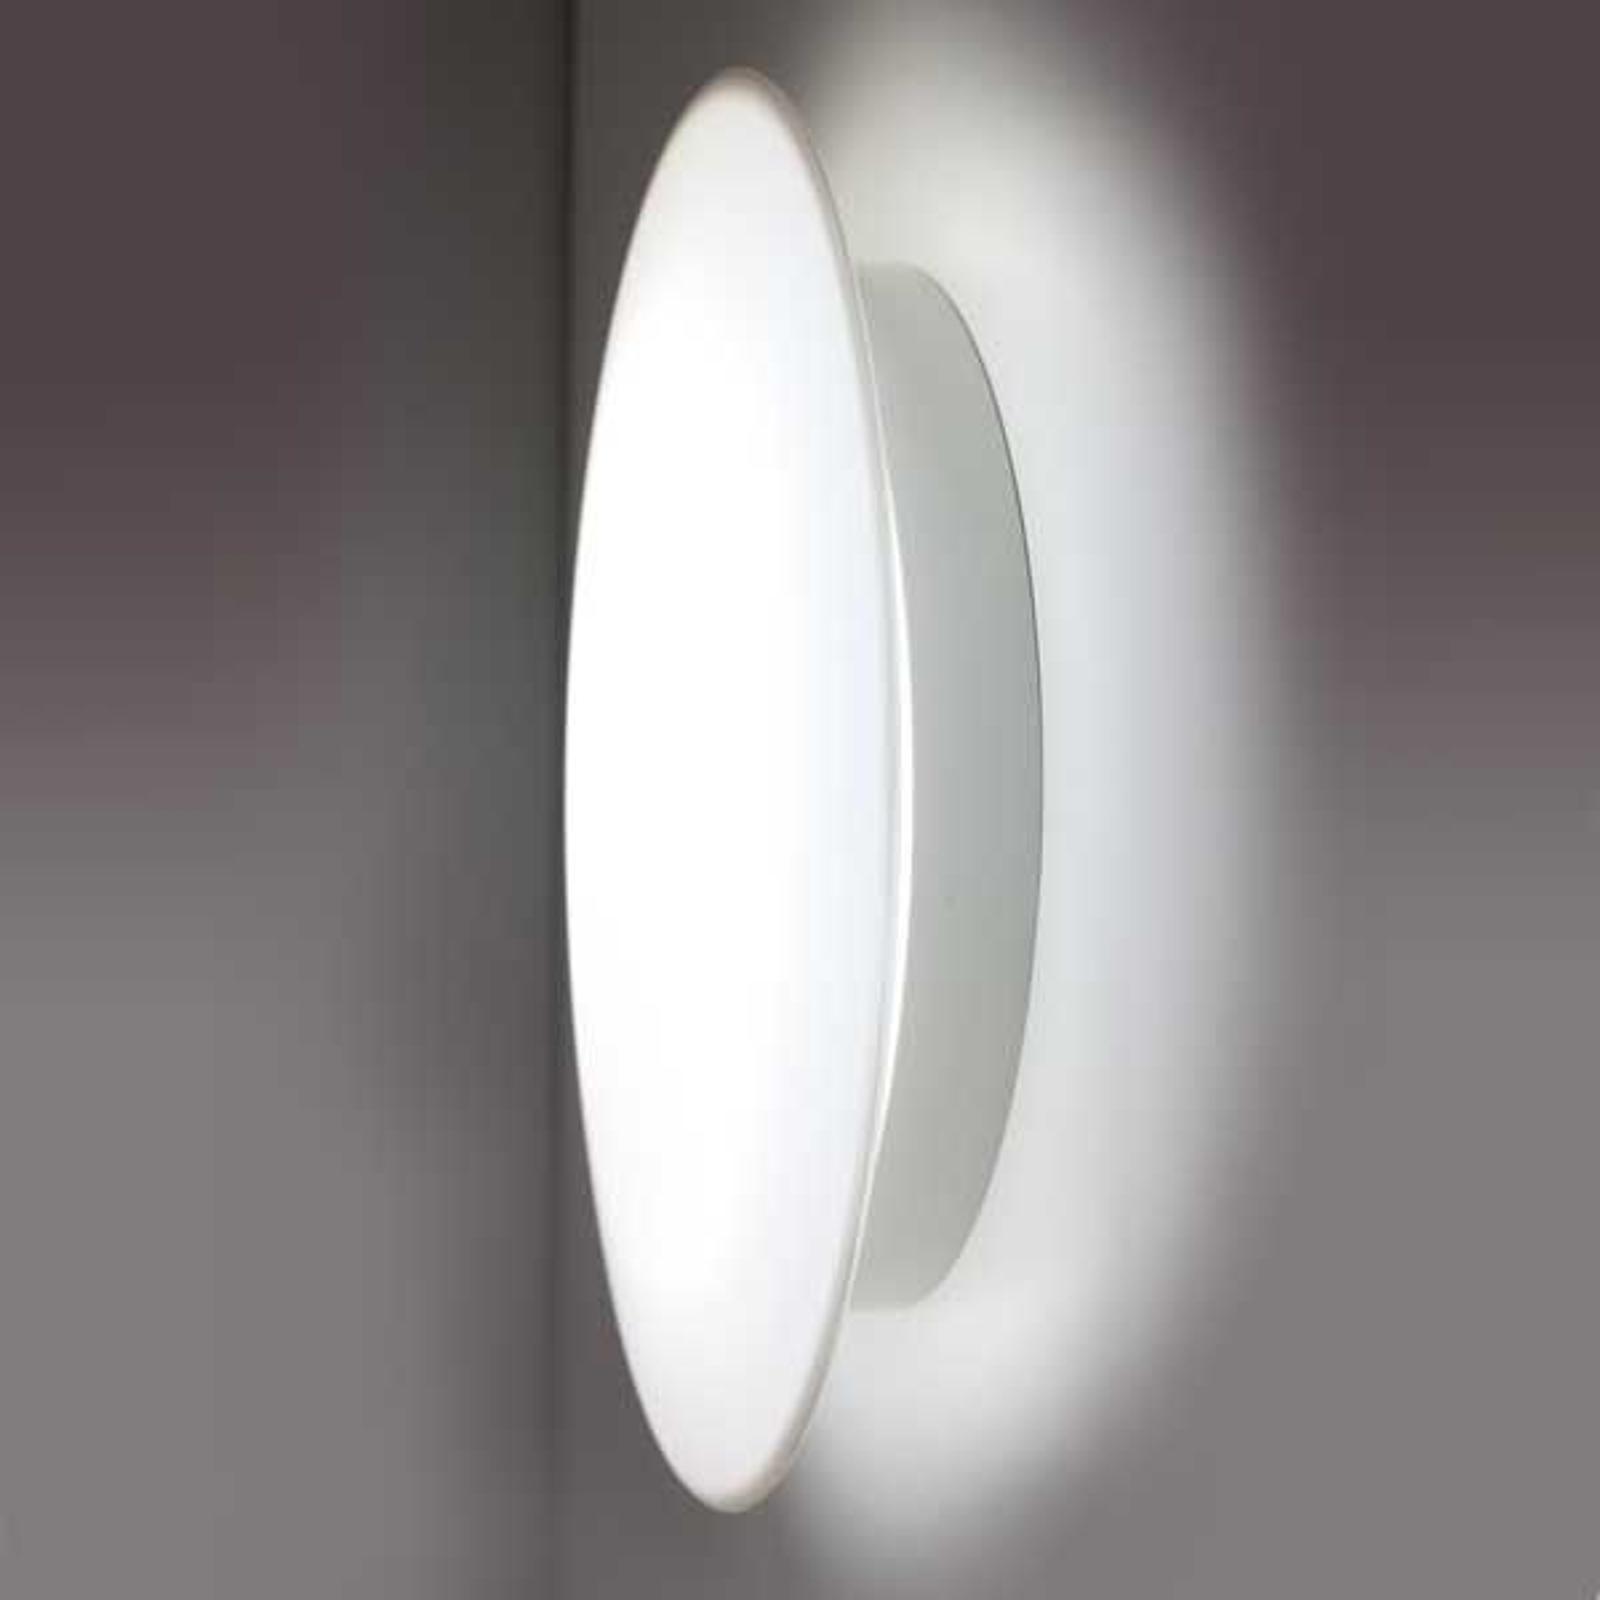 LED-Wandleuchte Sun 3 aus Kunststoff 3.000K 18W